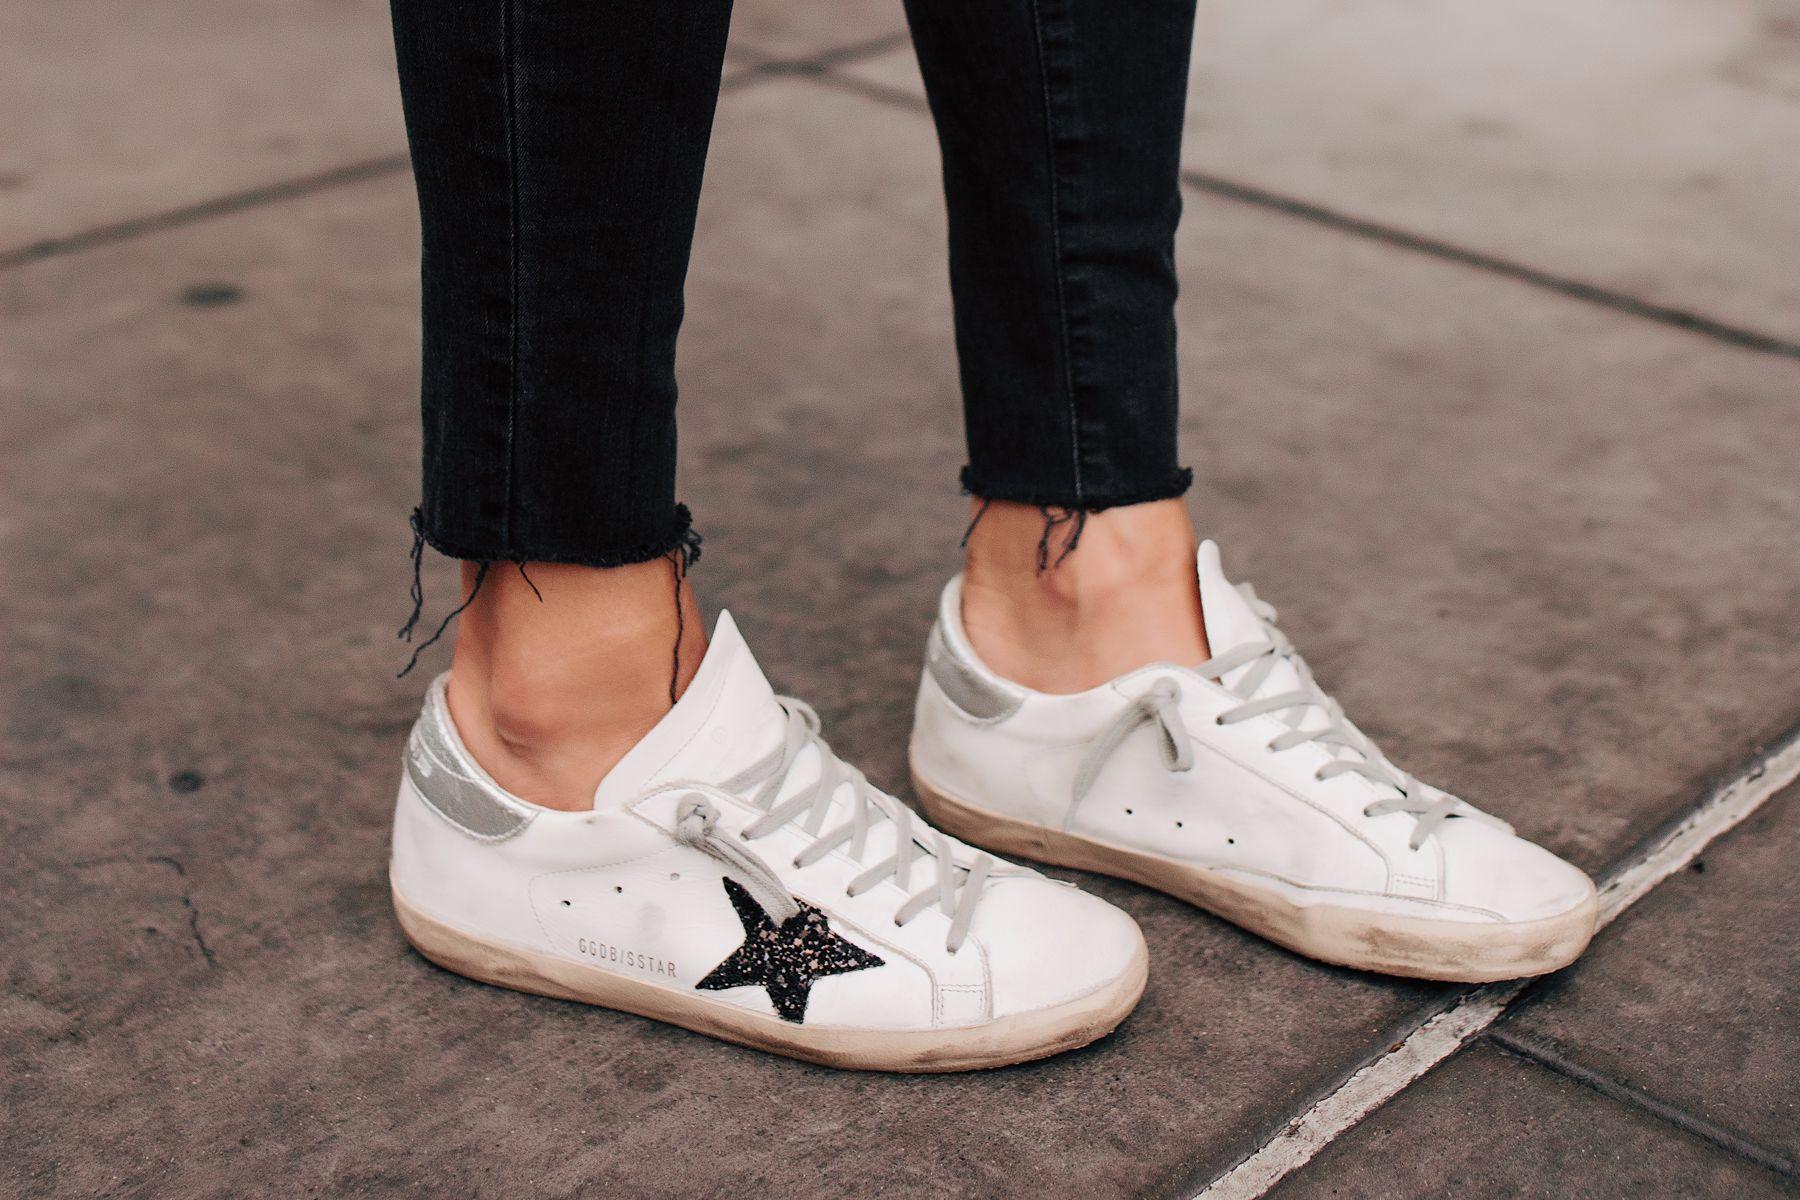 Golden Lace Deluxe Jackson Fashion Brand Shoe Sneakers Tying Goose uZPkiOTX